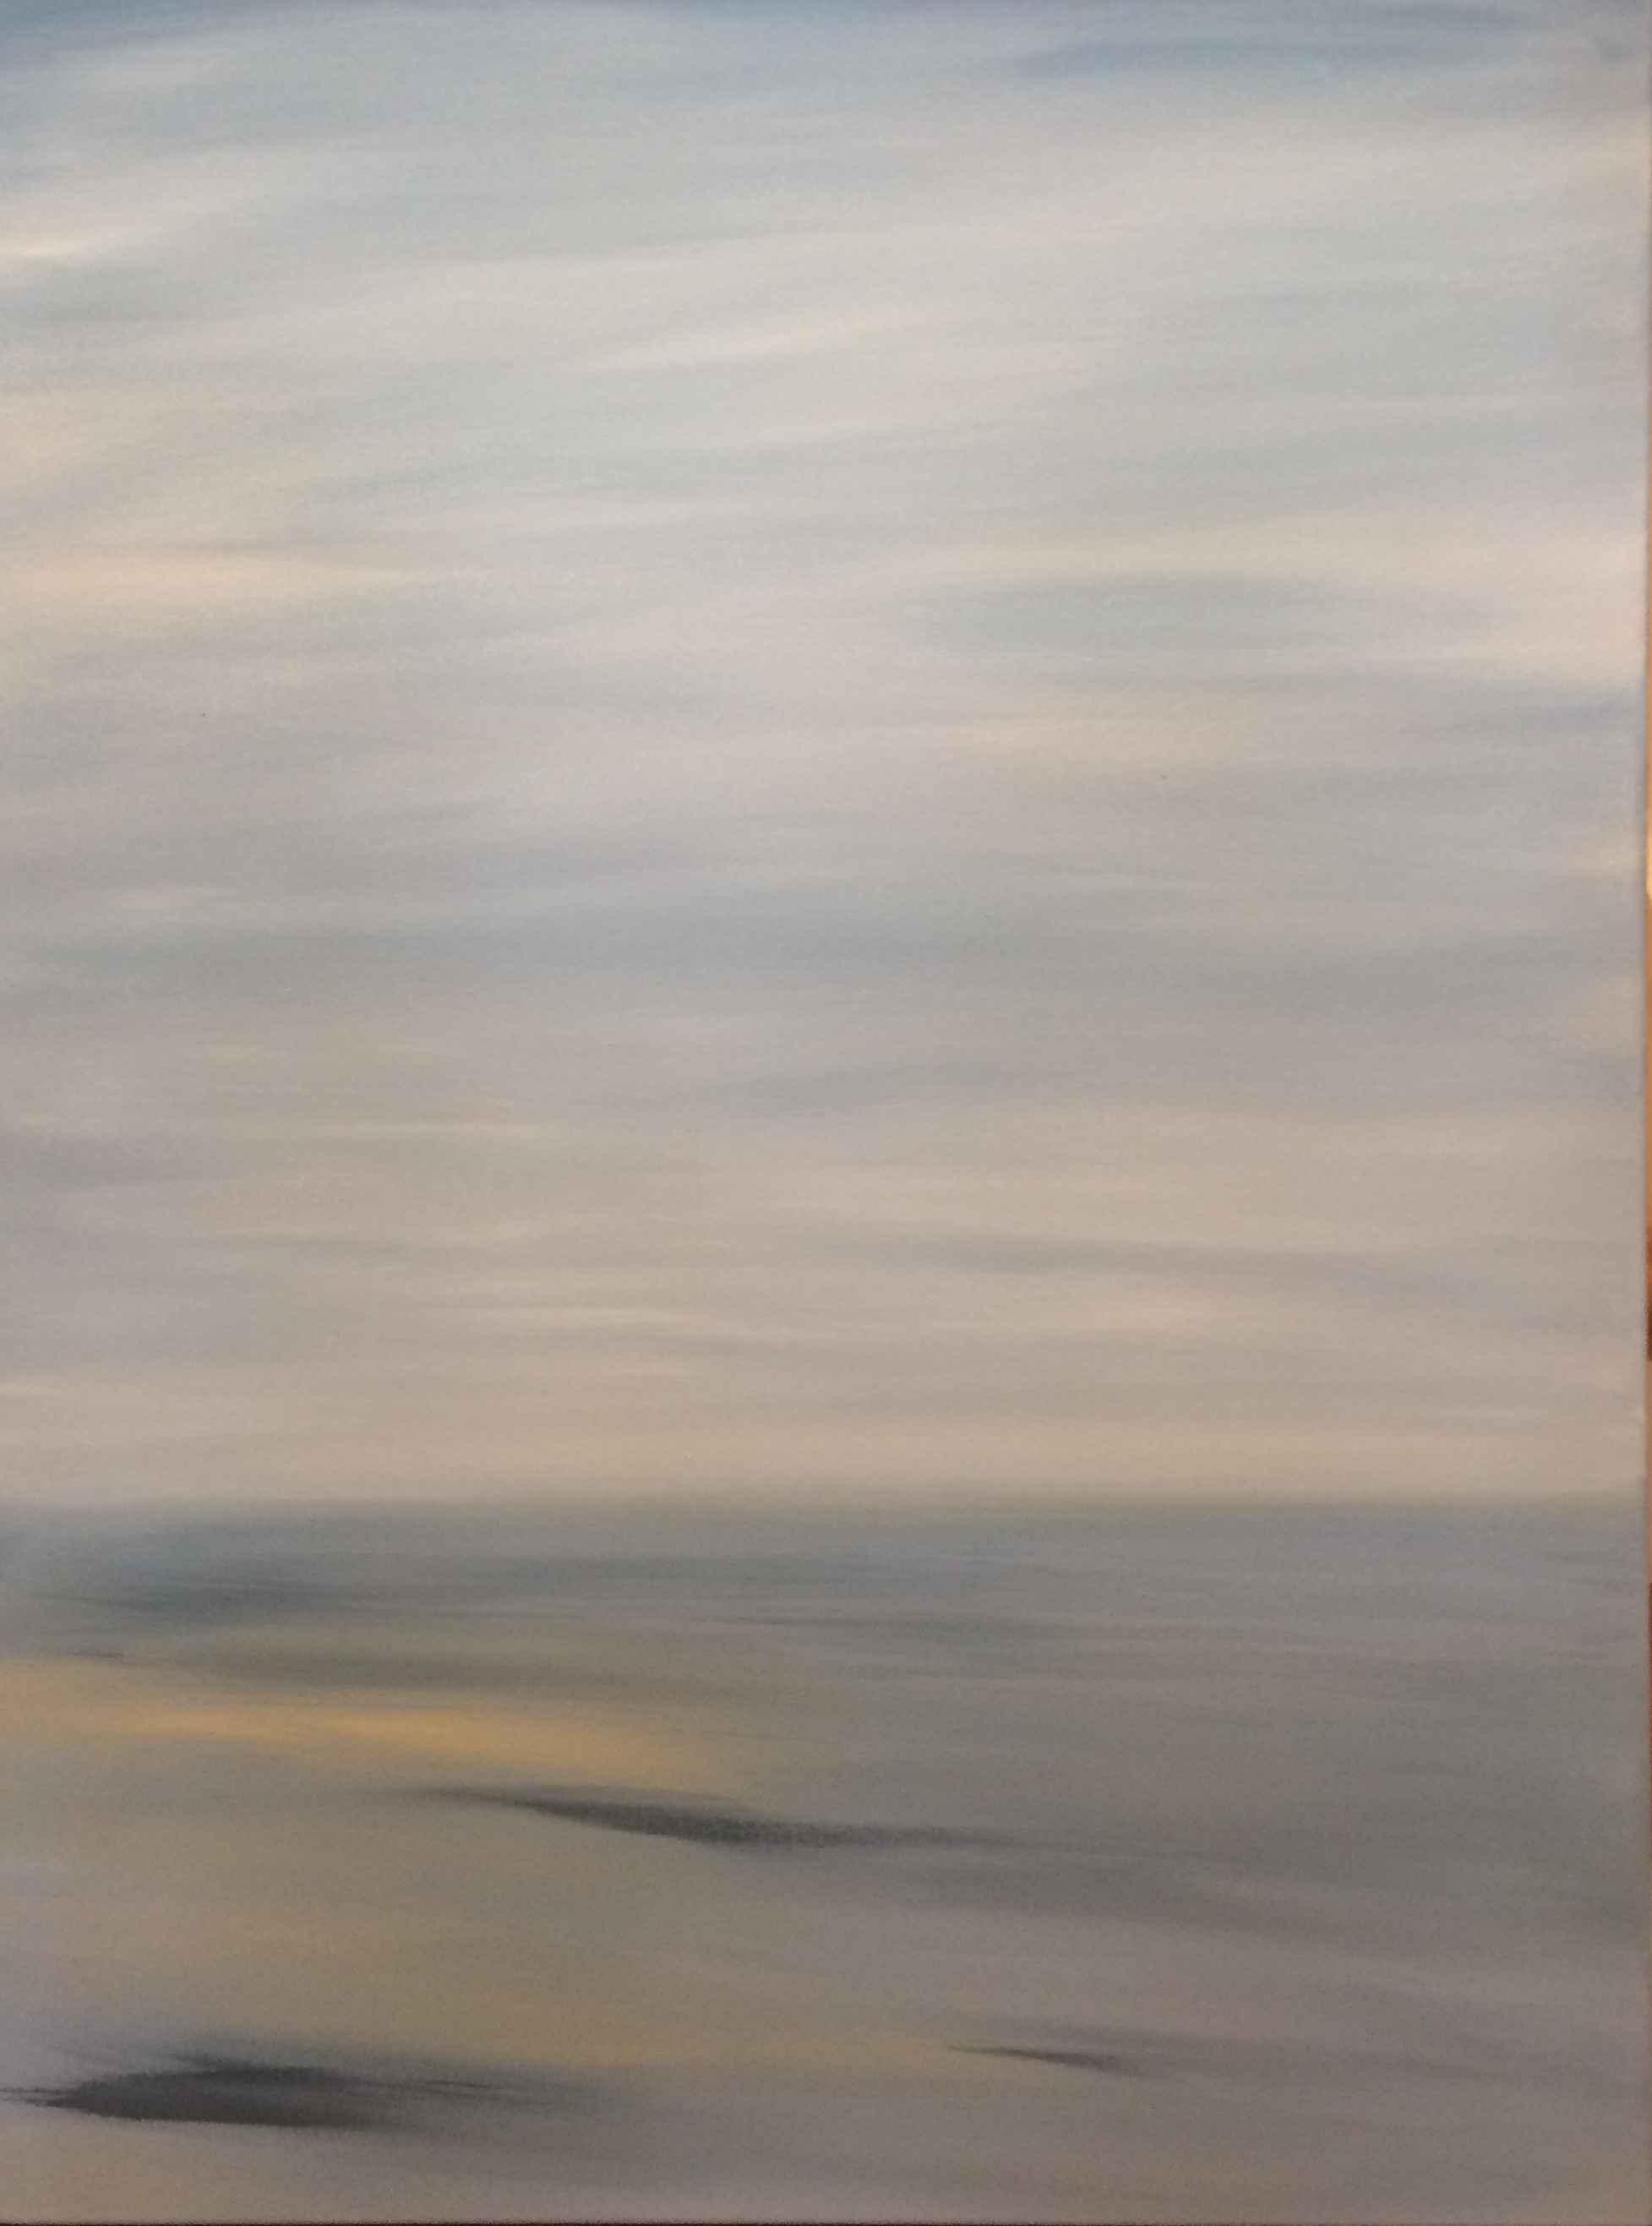 Morning Light by  Steve Lyons - Masterpiece Online